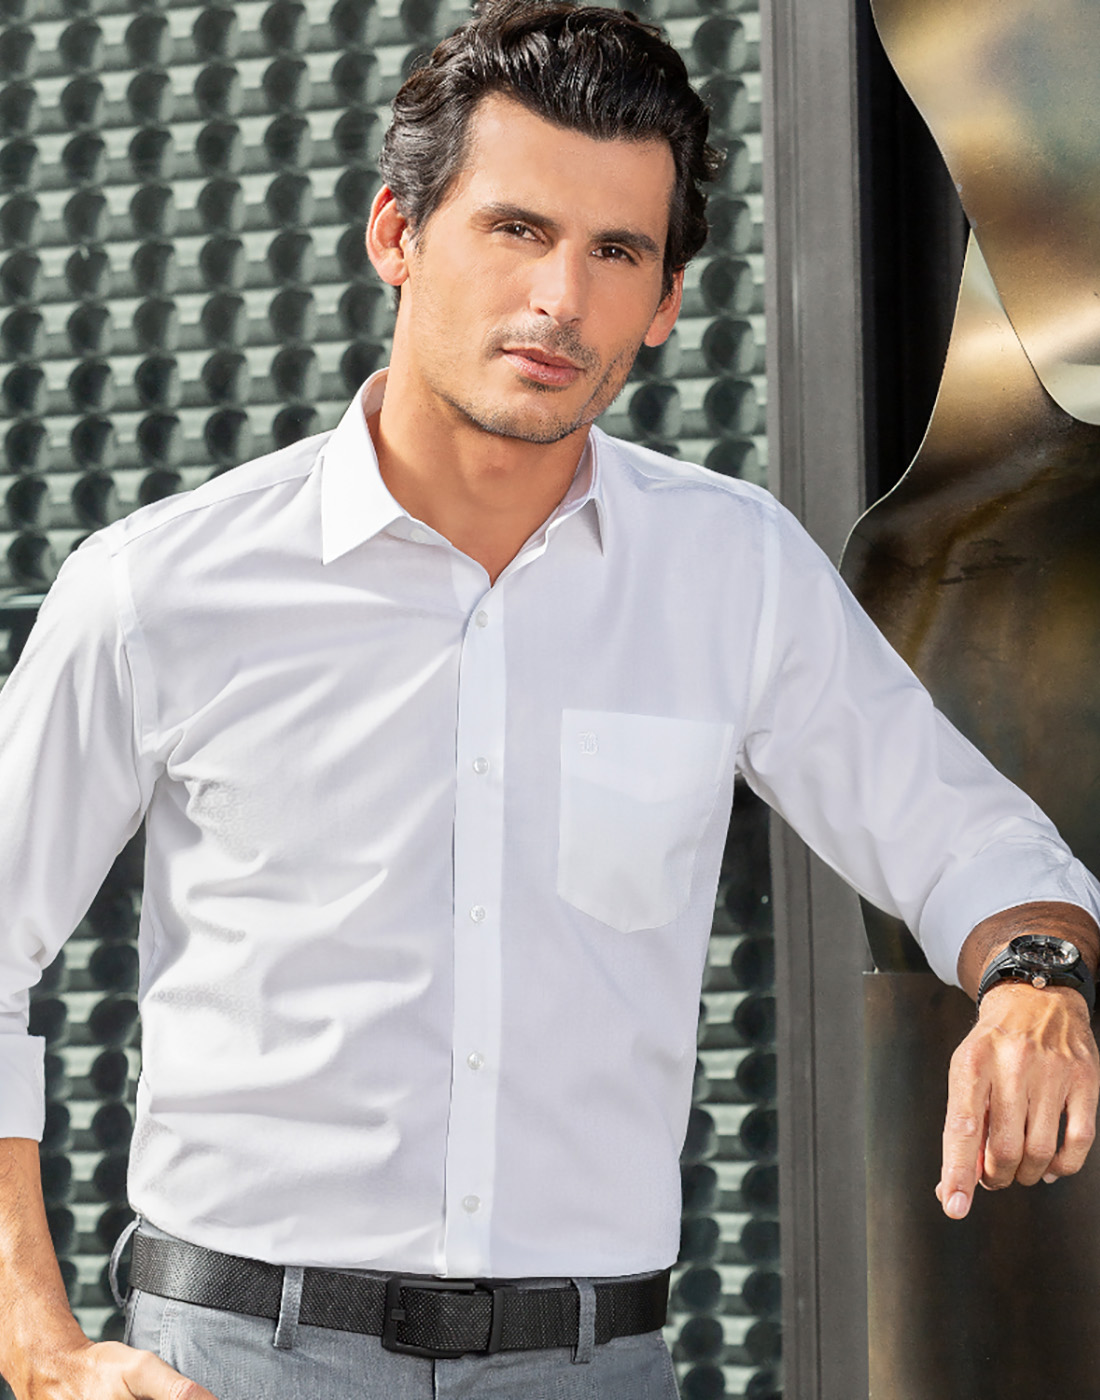 Camisa Manga Longa com Bolso Lisa Branco - Baumgarten Premium